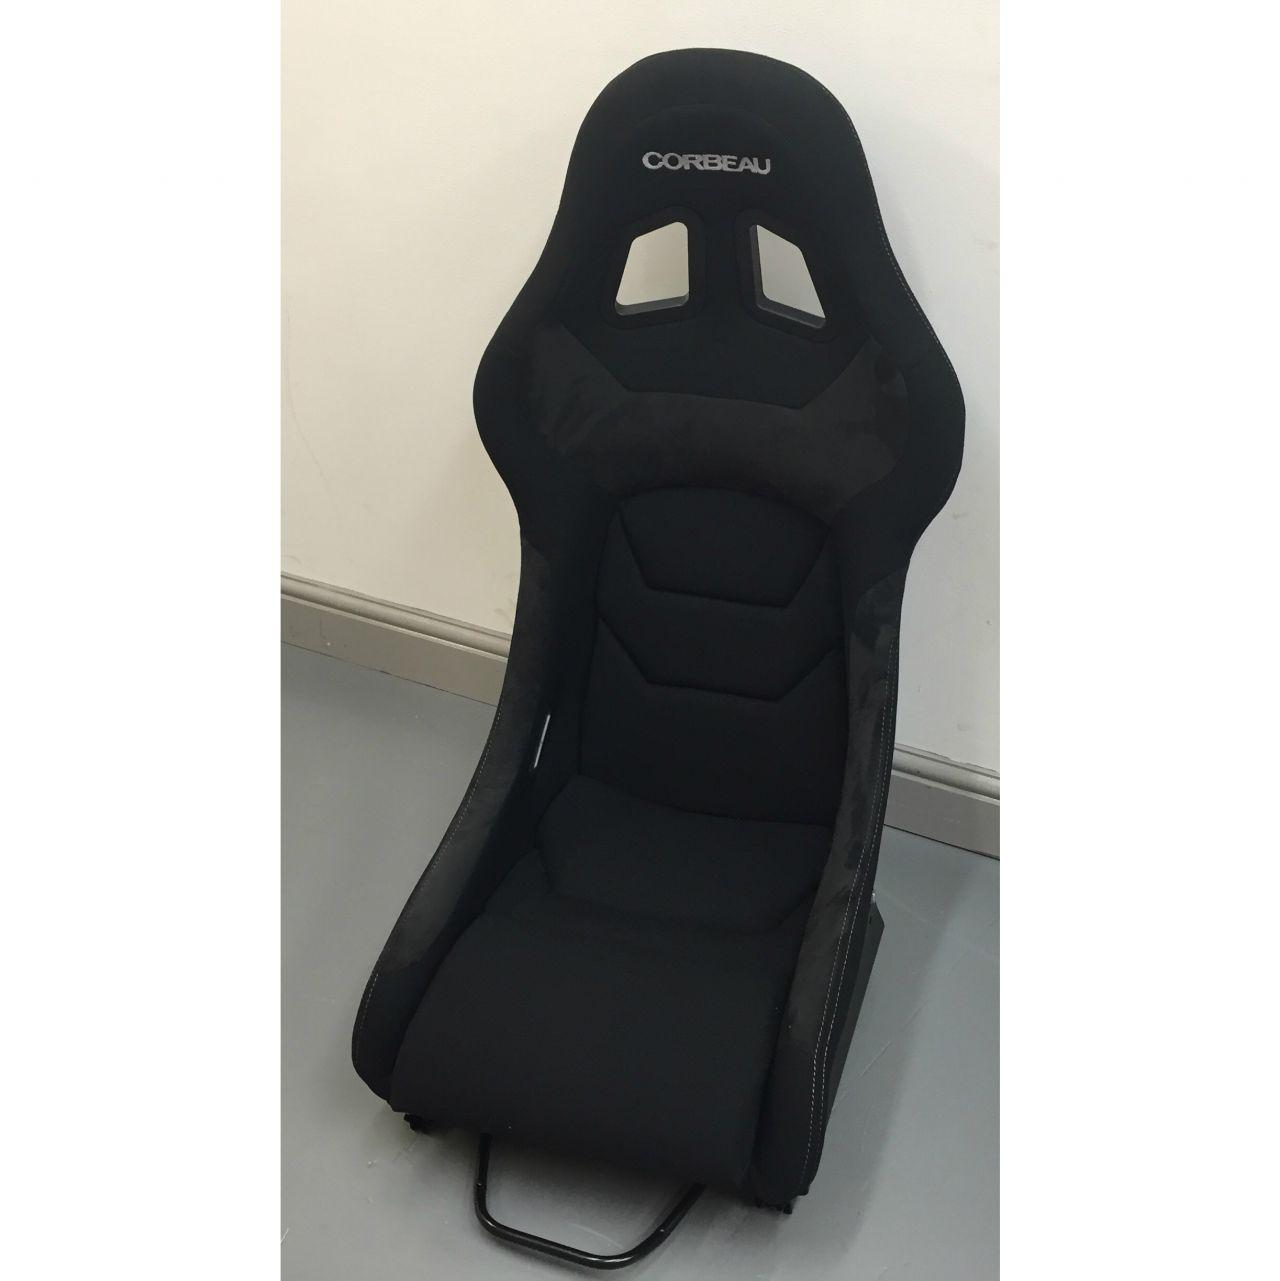 Corbeau Sport Seat Review >> Corbeau Seats Uk Related Keywords - Corbeau Seats Uk Long Tail Keywords KeywordsKing